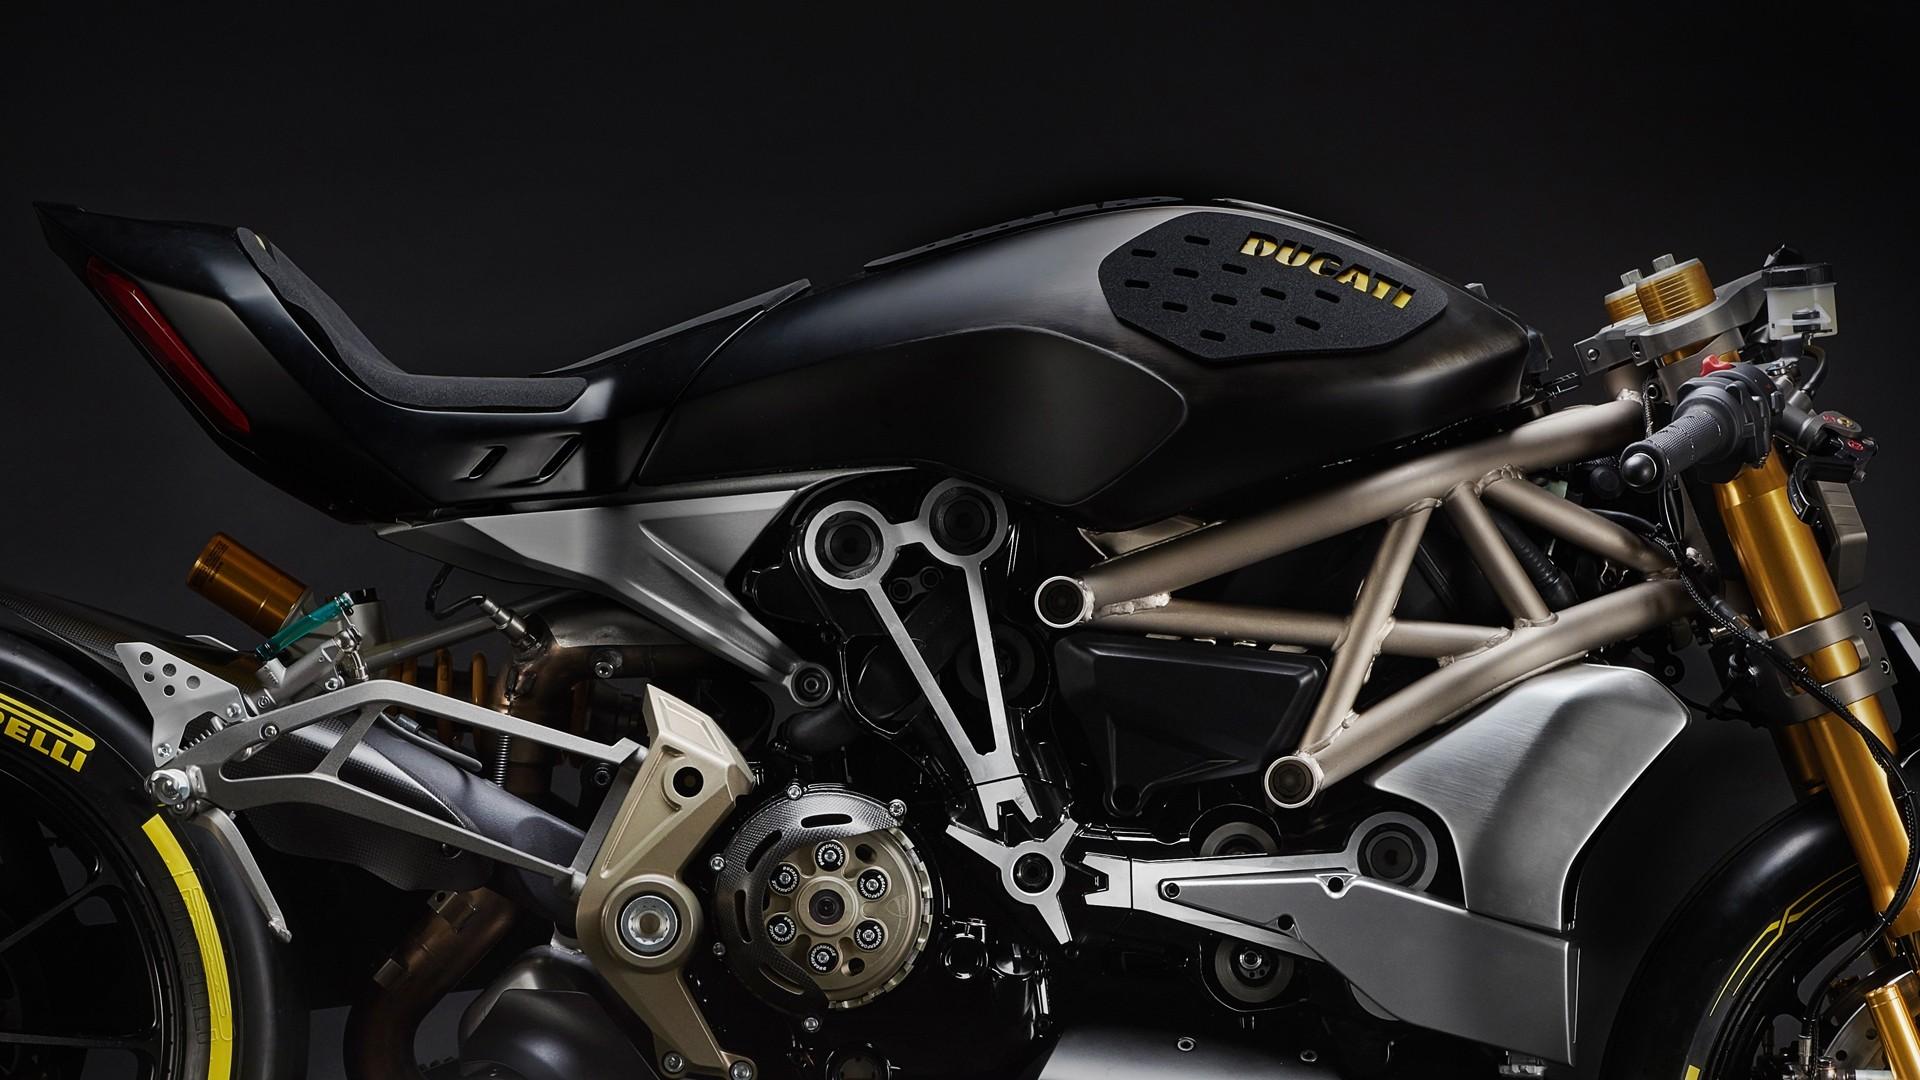 785c2221 Ducati Shows the draXter Concept, a Sport Interpretation of the ...